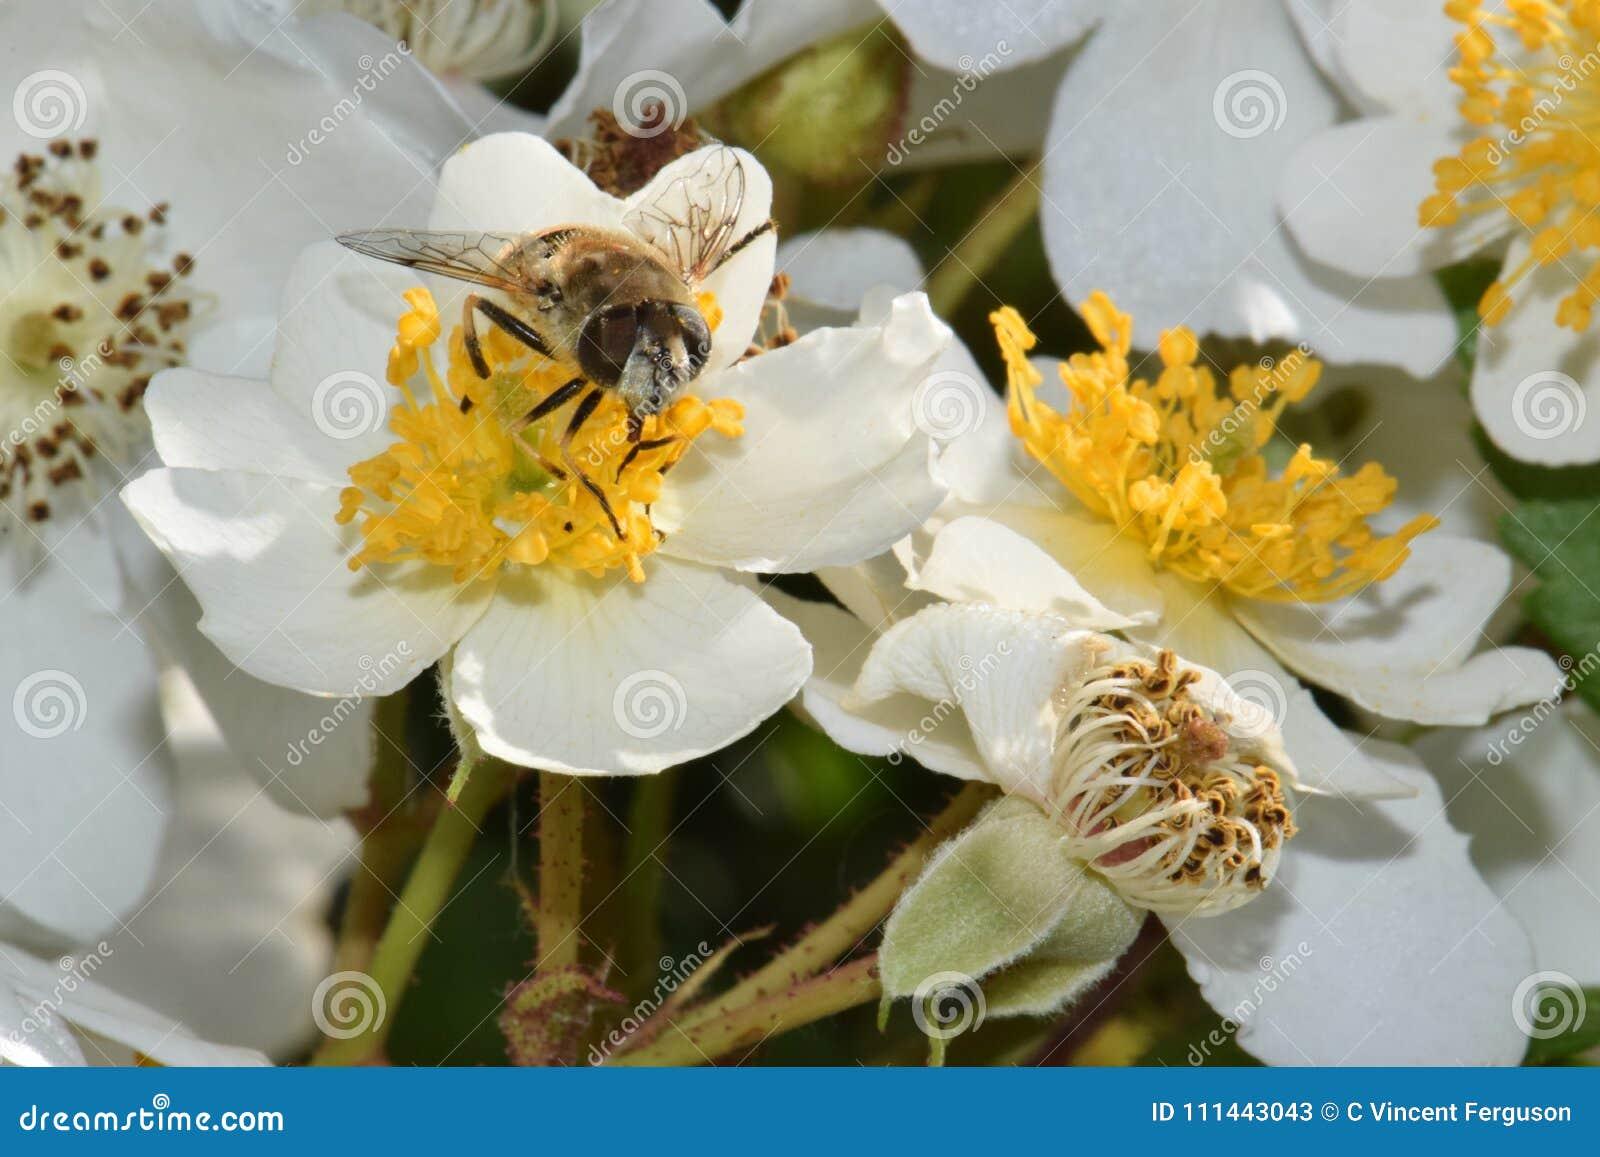 Bee Closeup in White Flower Heaven 03